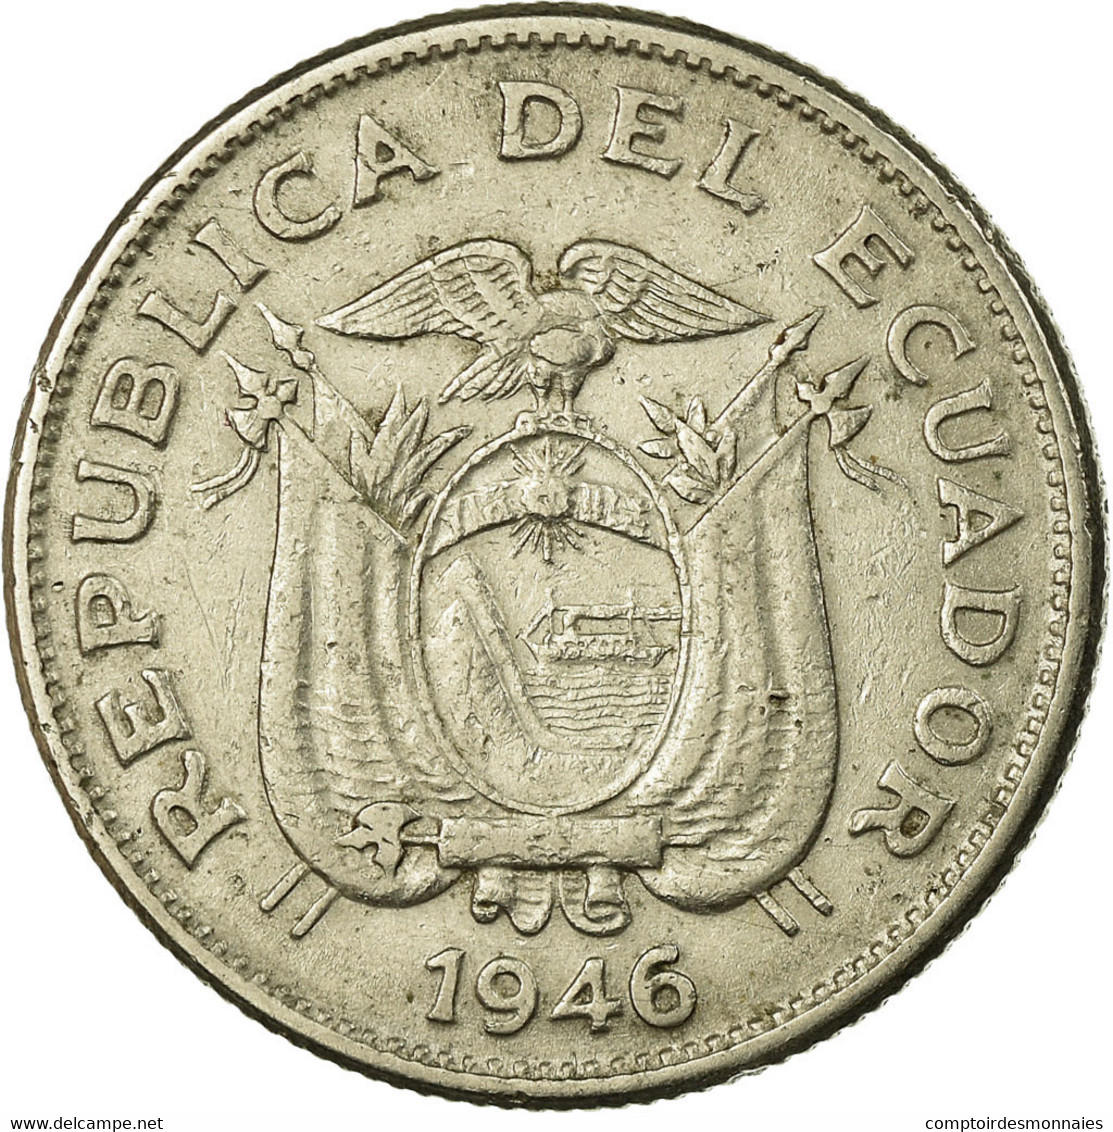 Monnaie, Équateur, Sucre, Un, 1946, TB+, Nickel, KM:78.2 - Ecuador